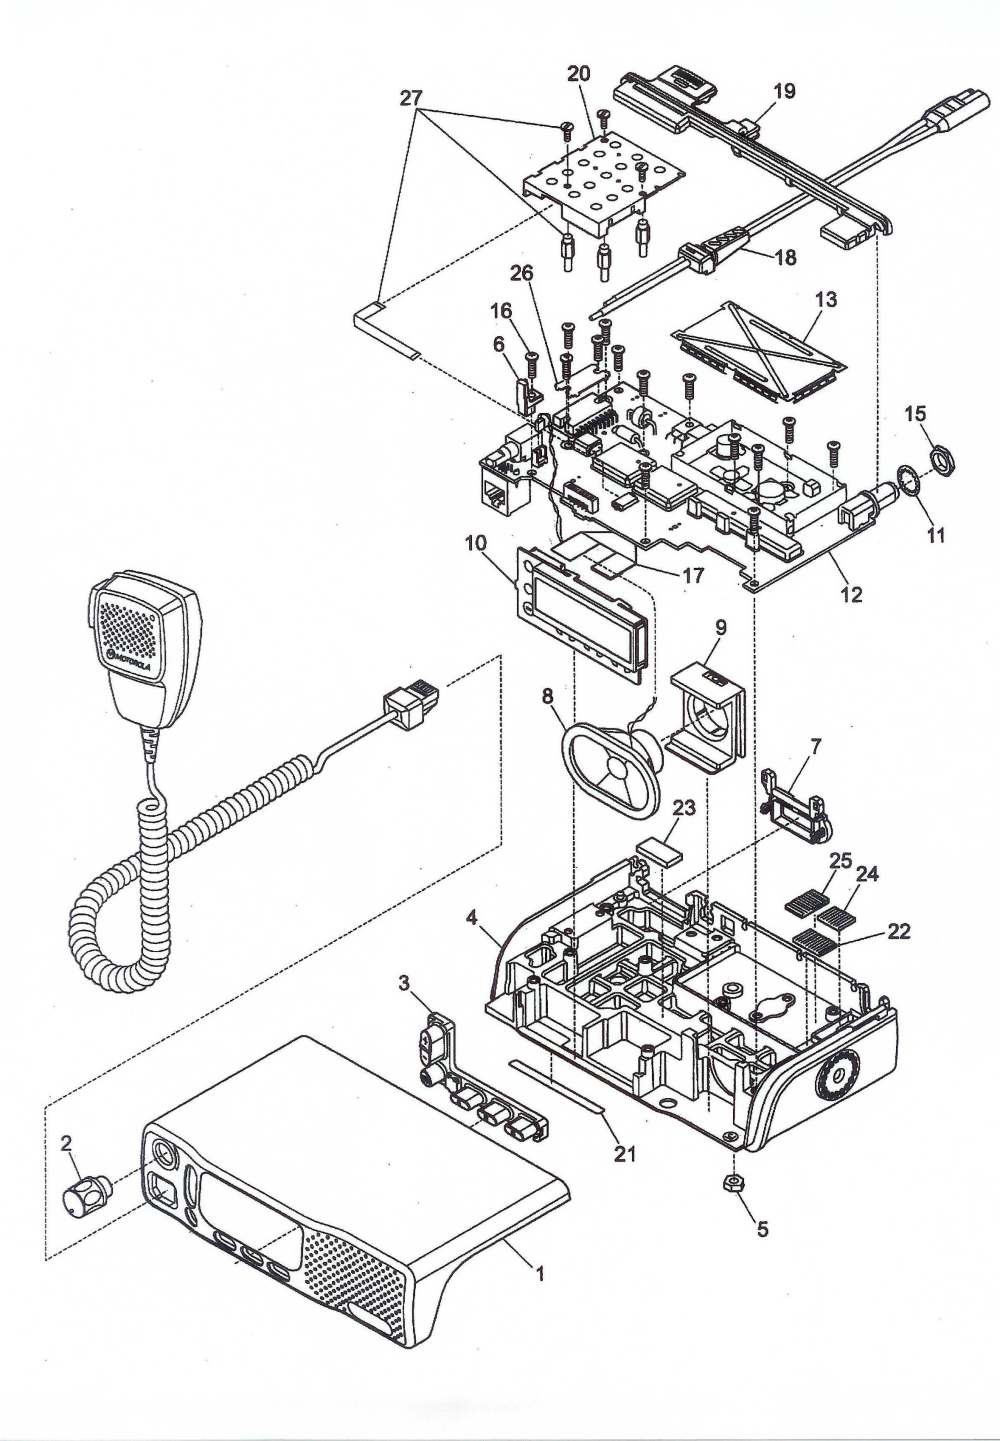 medium resolution of motorola cm300 wiring diagram wiring librarym1225 motorola m1225 motorola cm300 wiring diagram